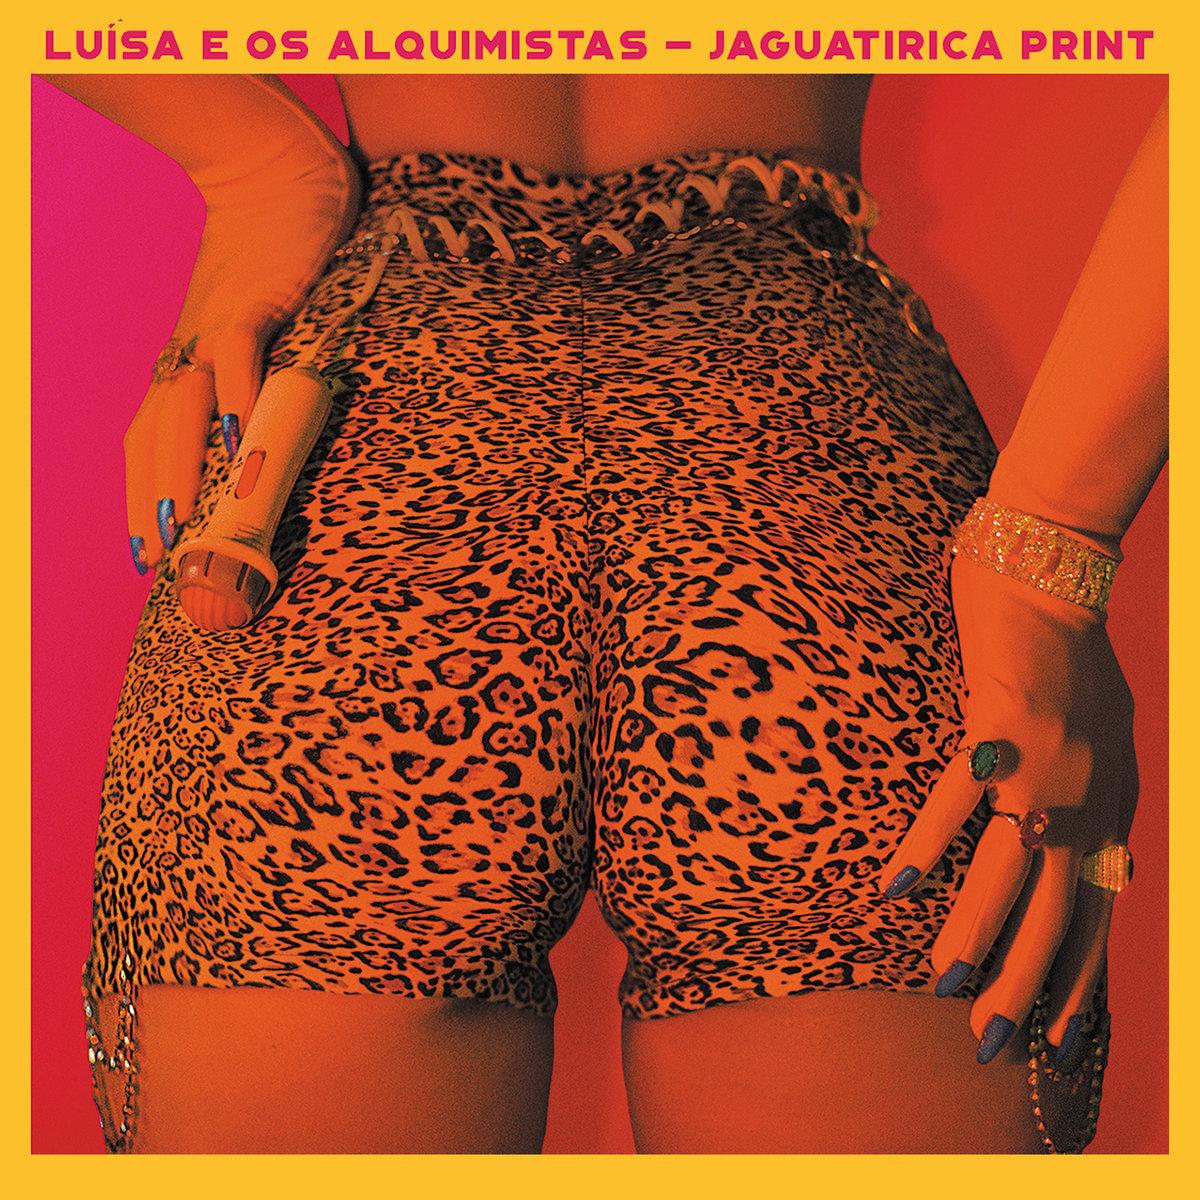 Jaguatirica Print. - Luísa e os Alquimistas.